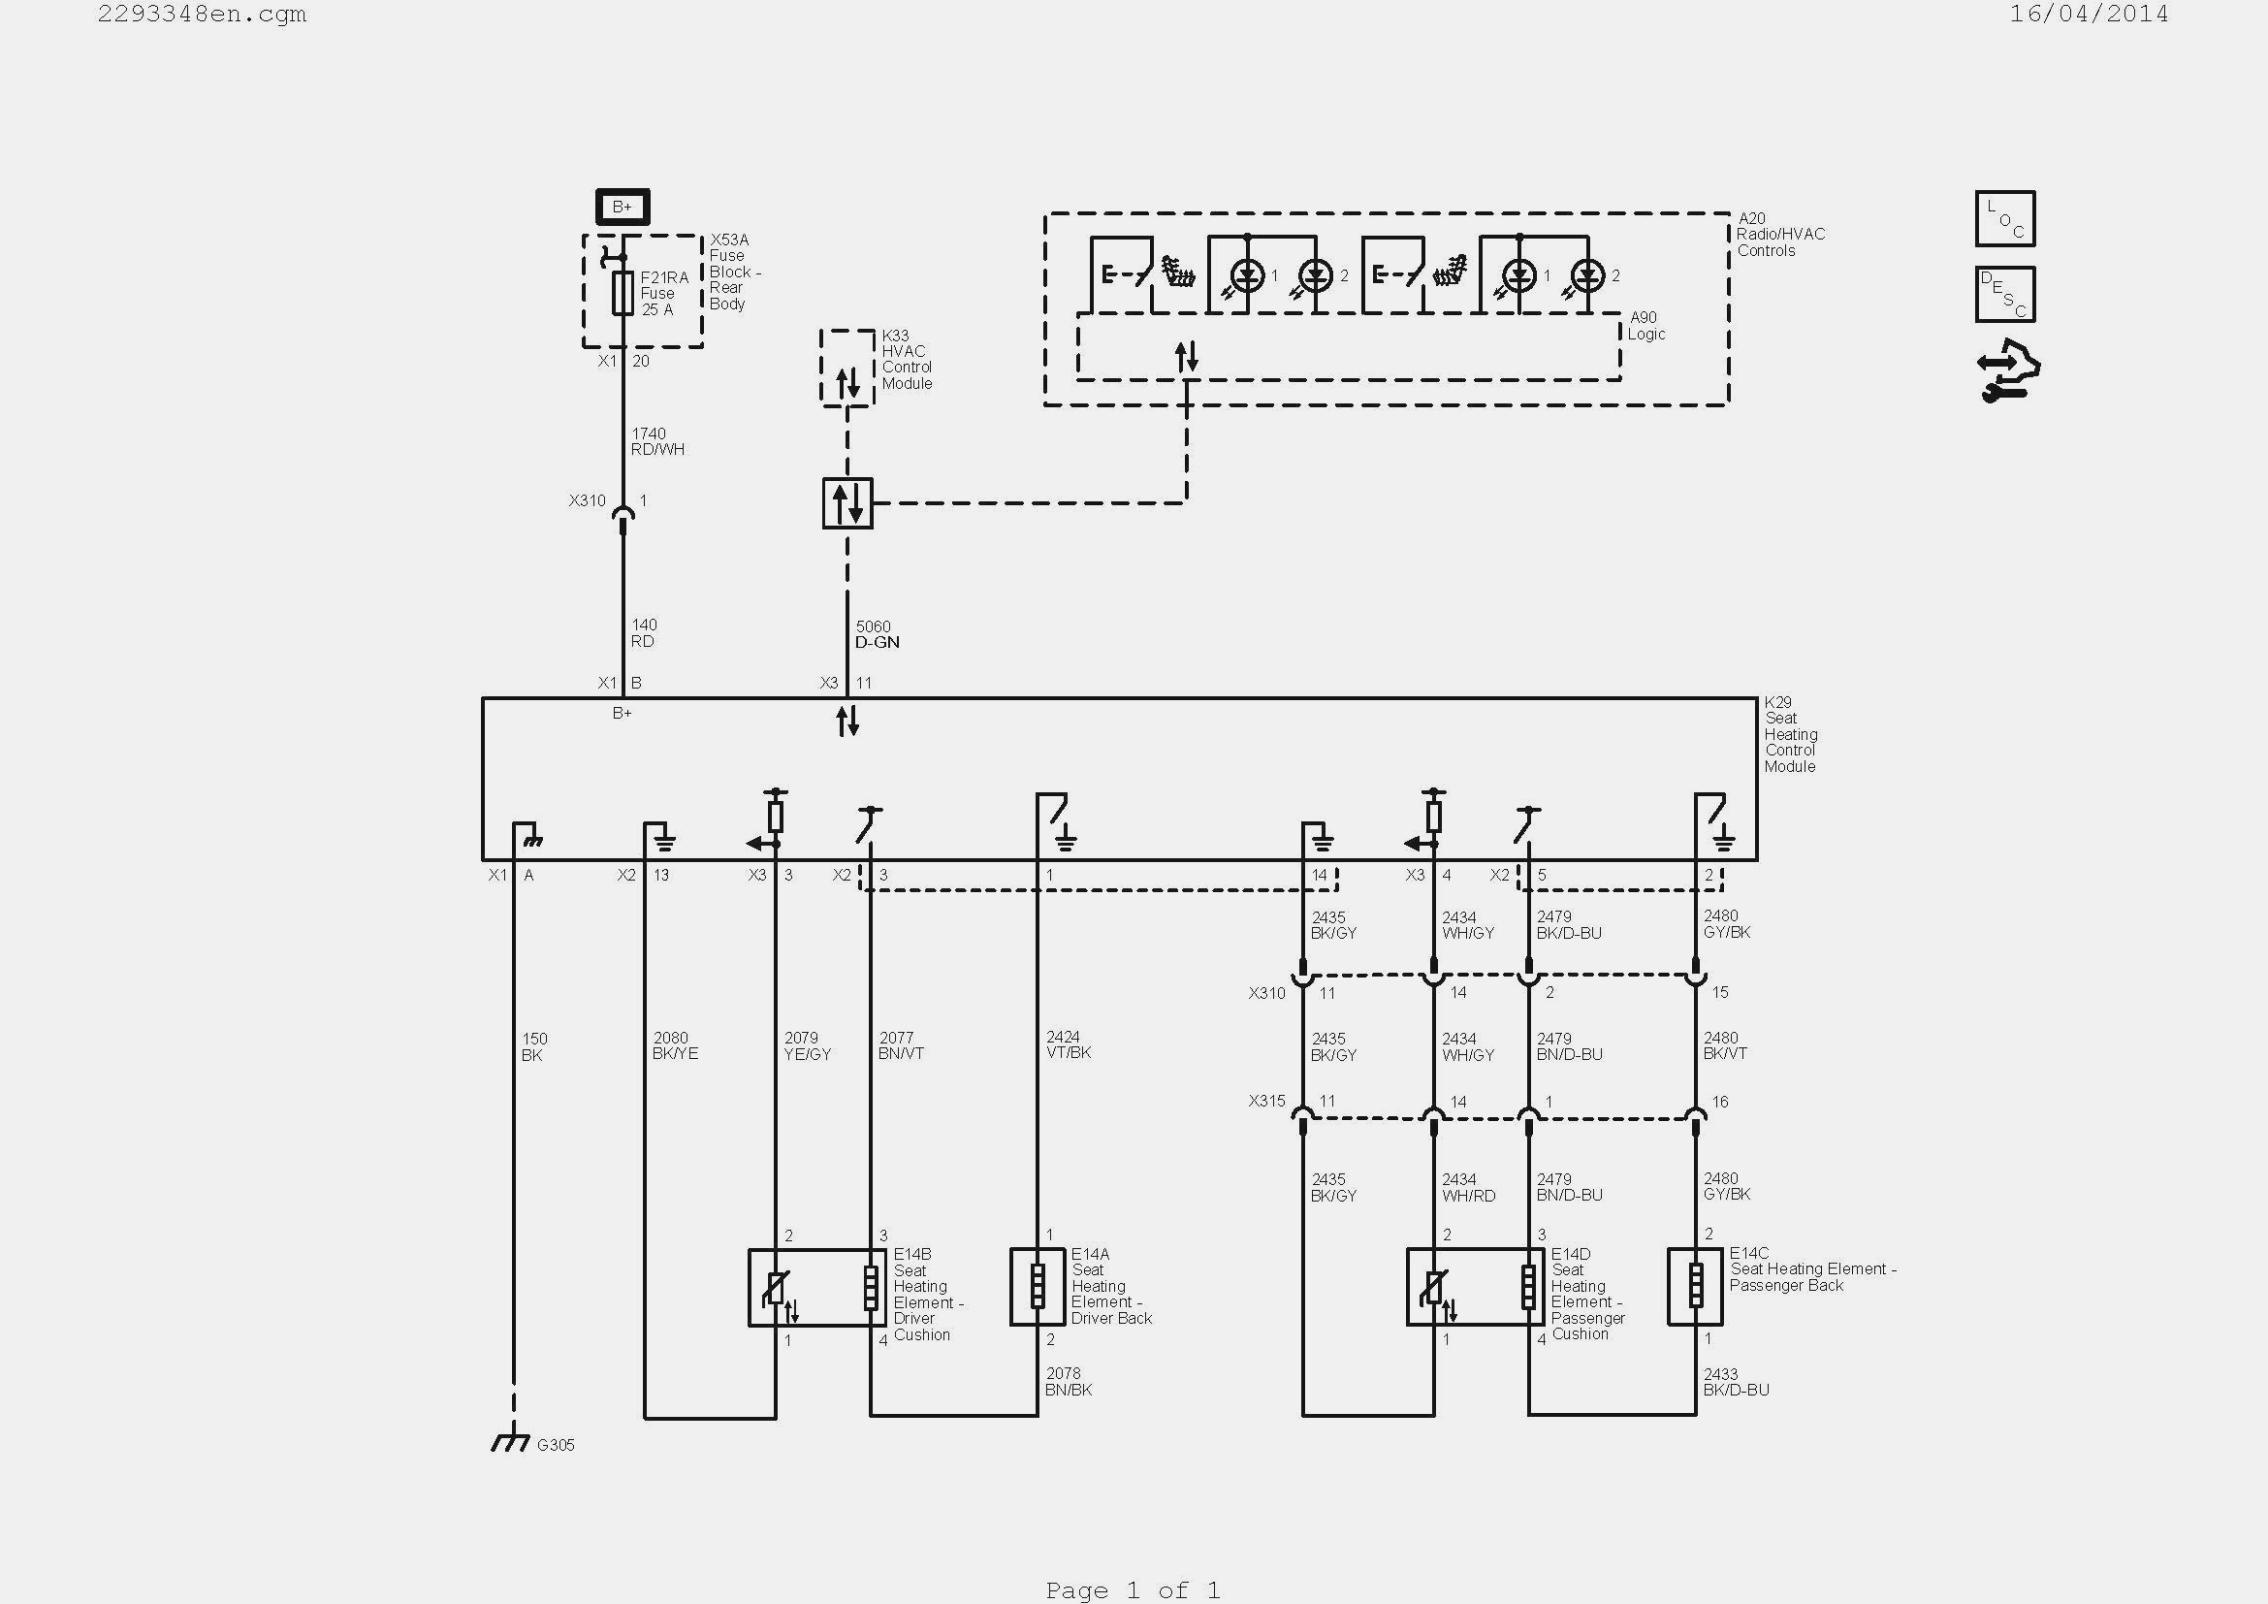 [SCHEMATICS_48EU]  EV_3115] Wiring Diagram Additionally Overhead Crane Wiring Diagram On Demag  Wiring Diagram | Demag Hoist Wiring Diagram |  | Spoat Over Epete Elae Jebrp Mohammedshrine Librar Wiring 101